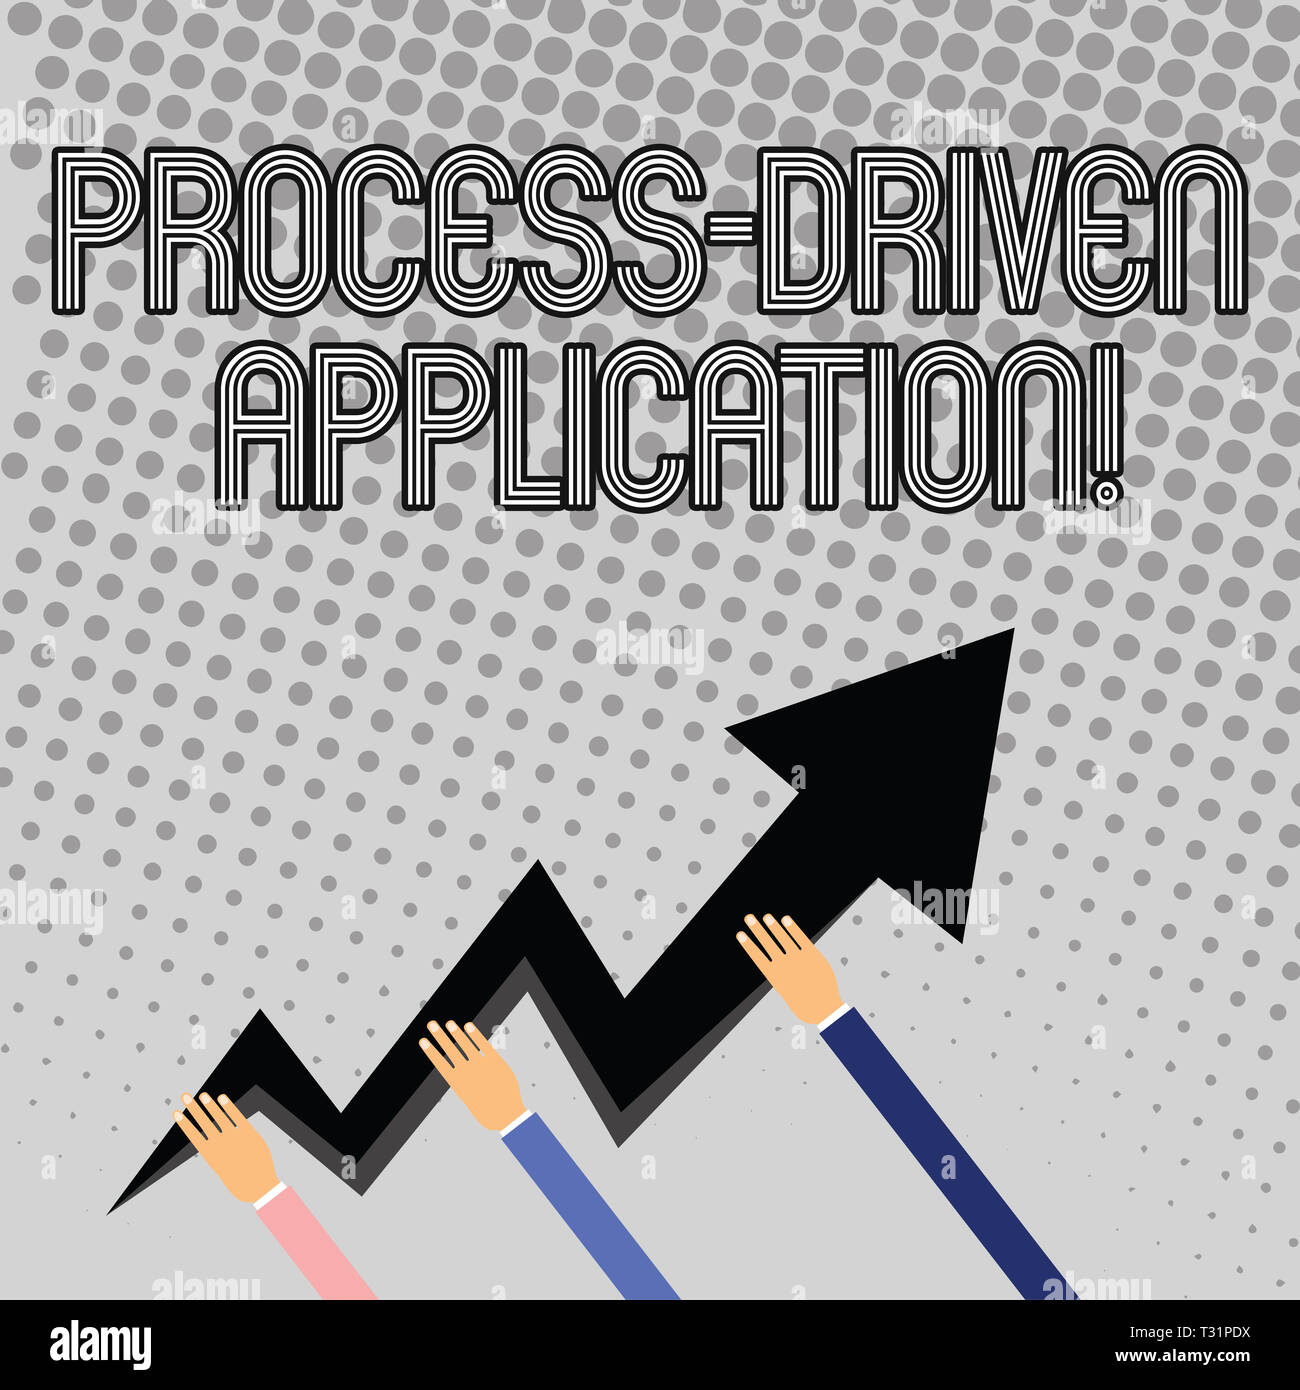 Handwriting text writing Process Driven Application